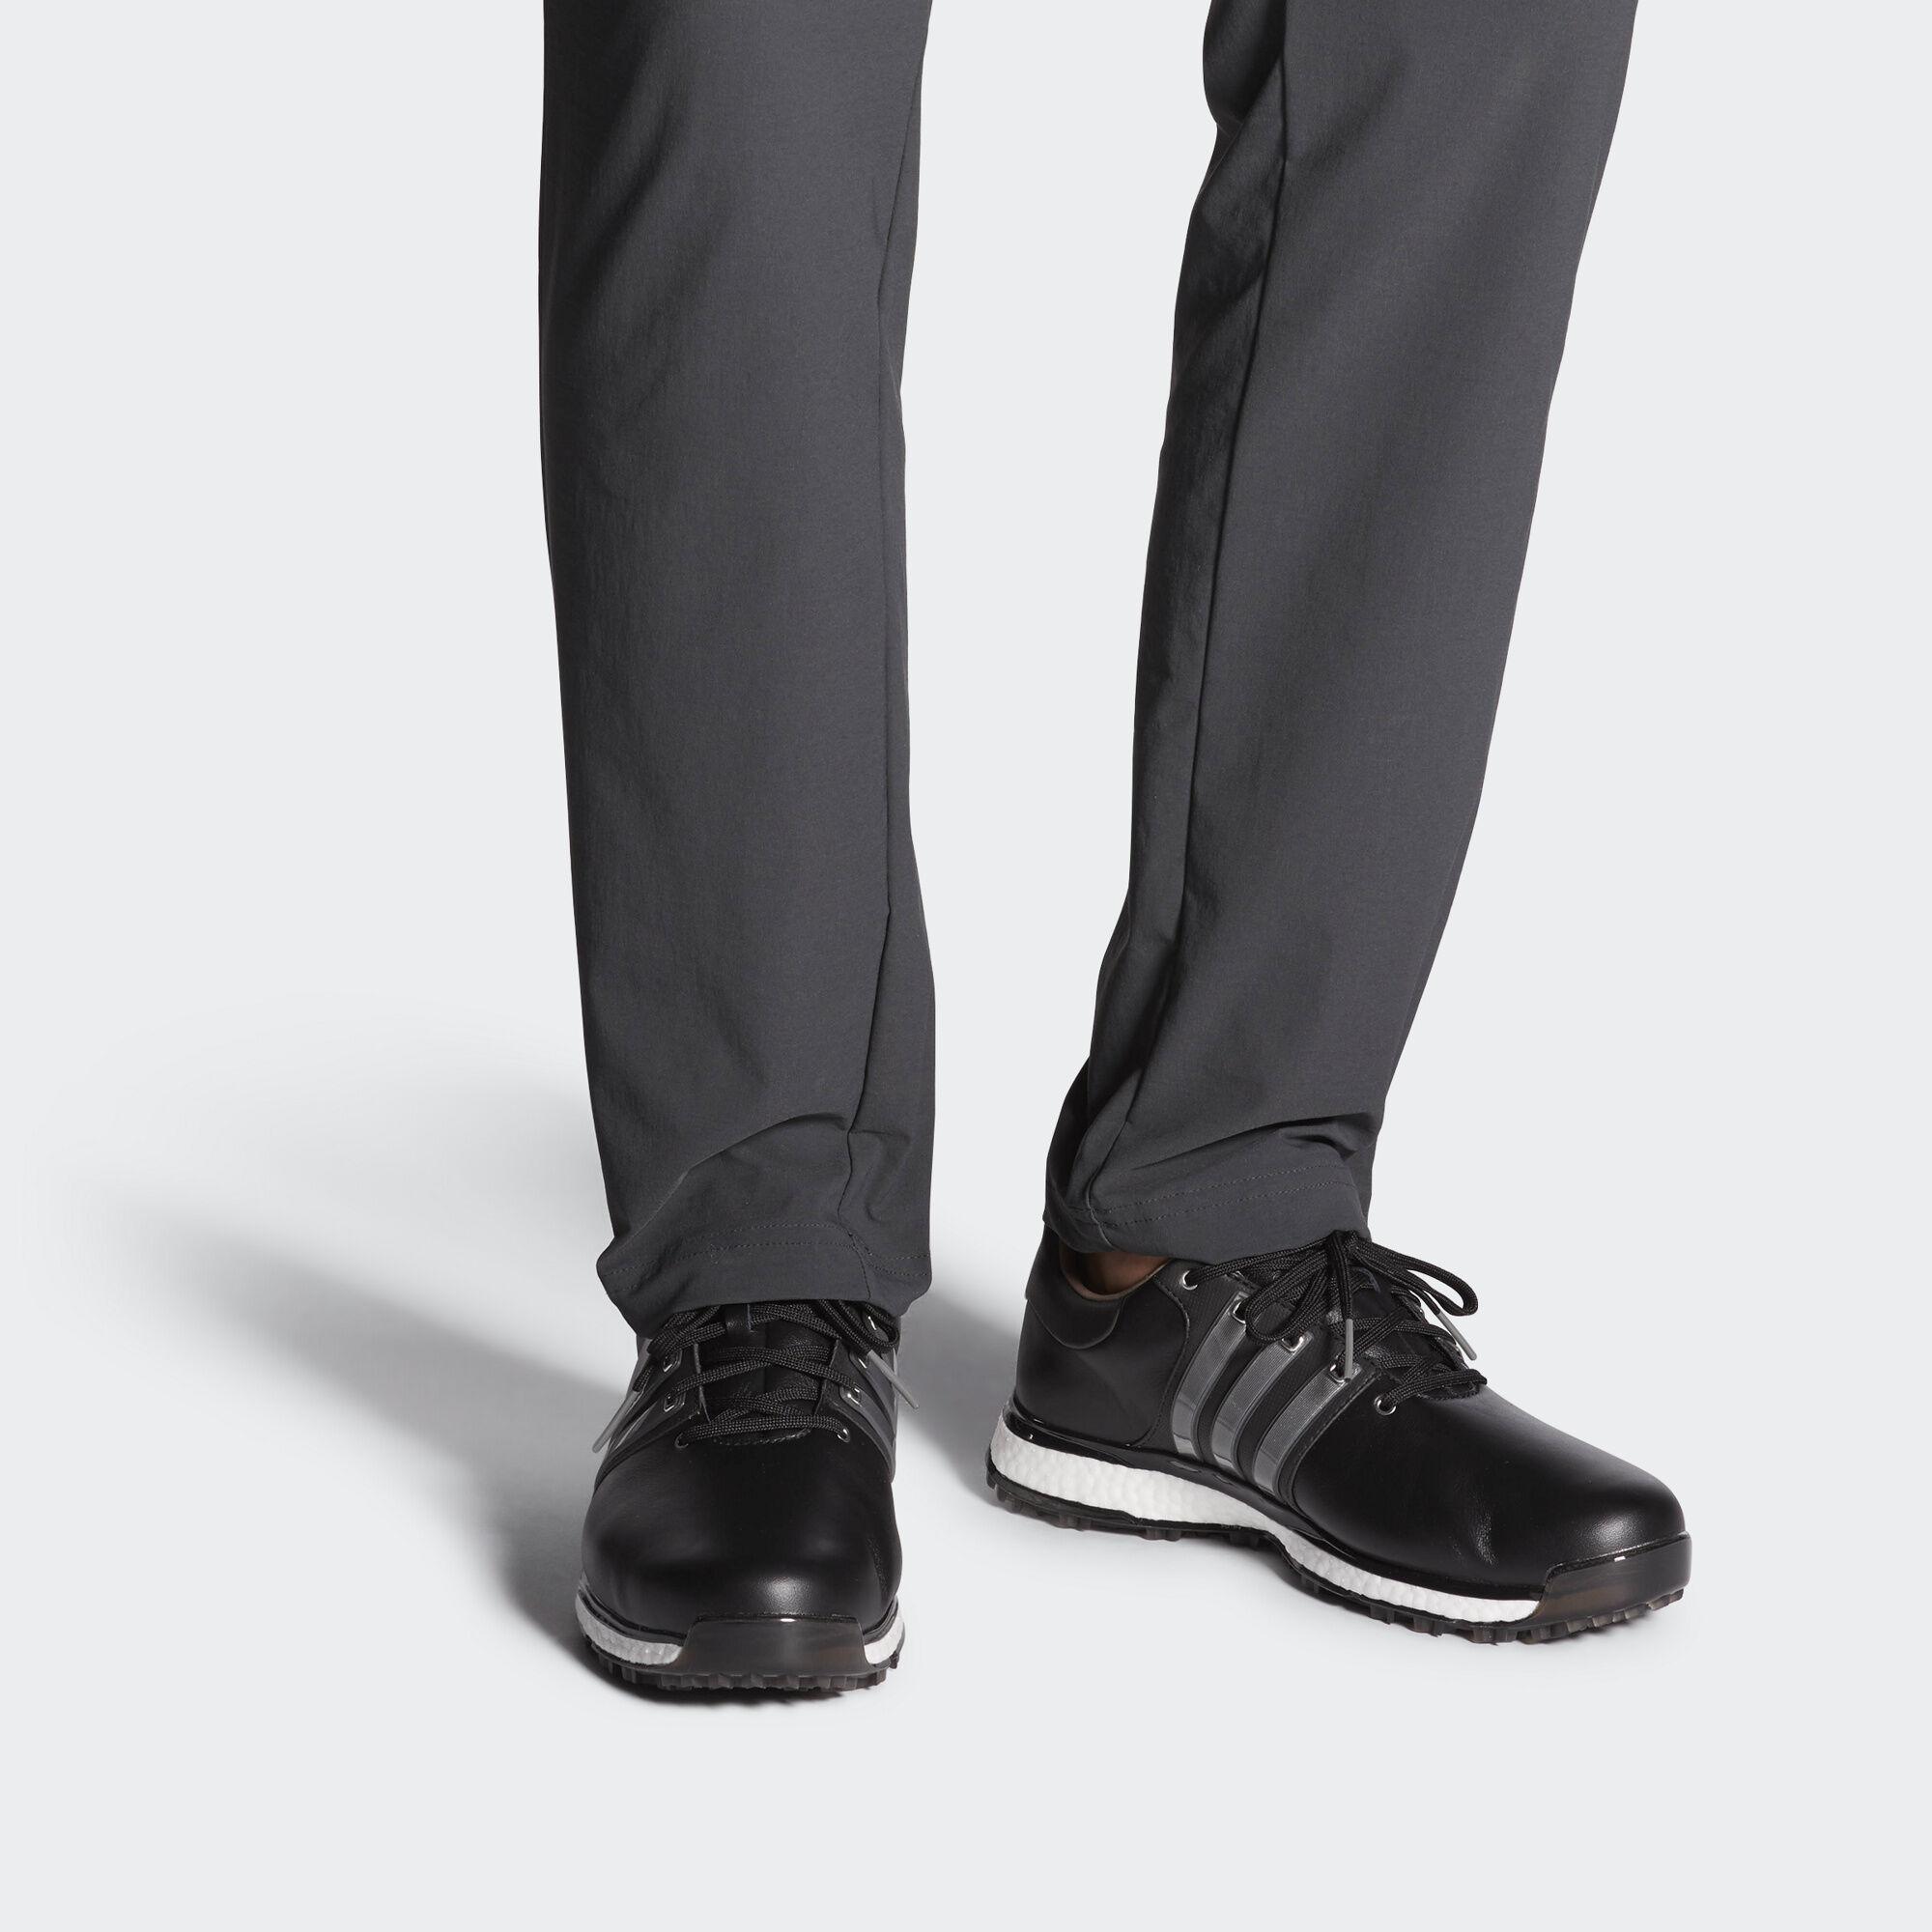 adidas Tour360 XT-SL Shoes - White  050a74aaf